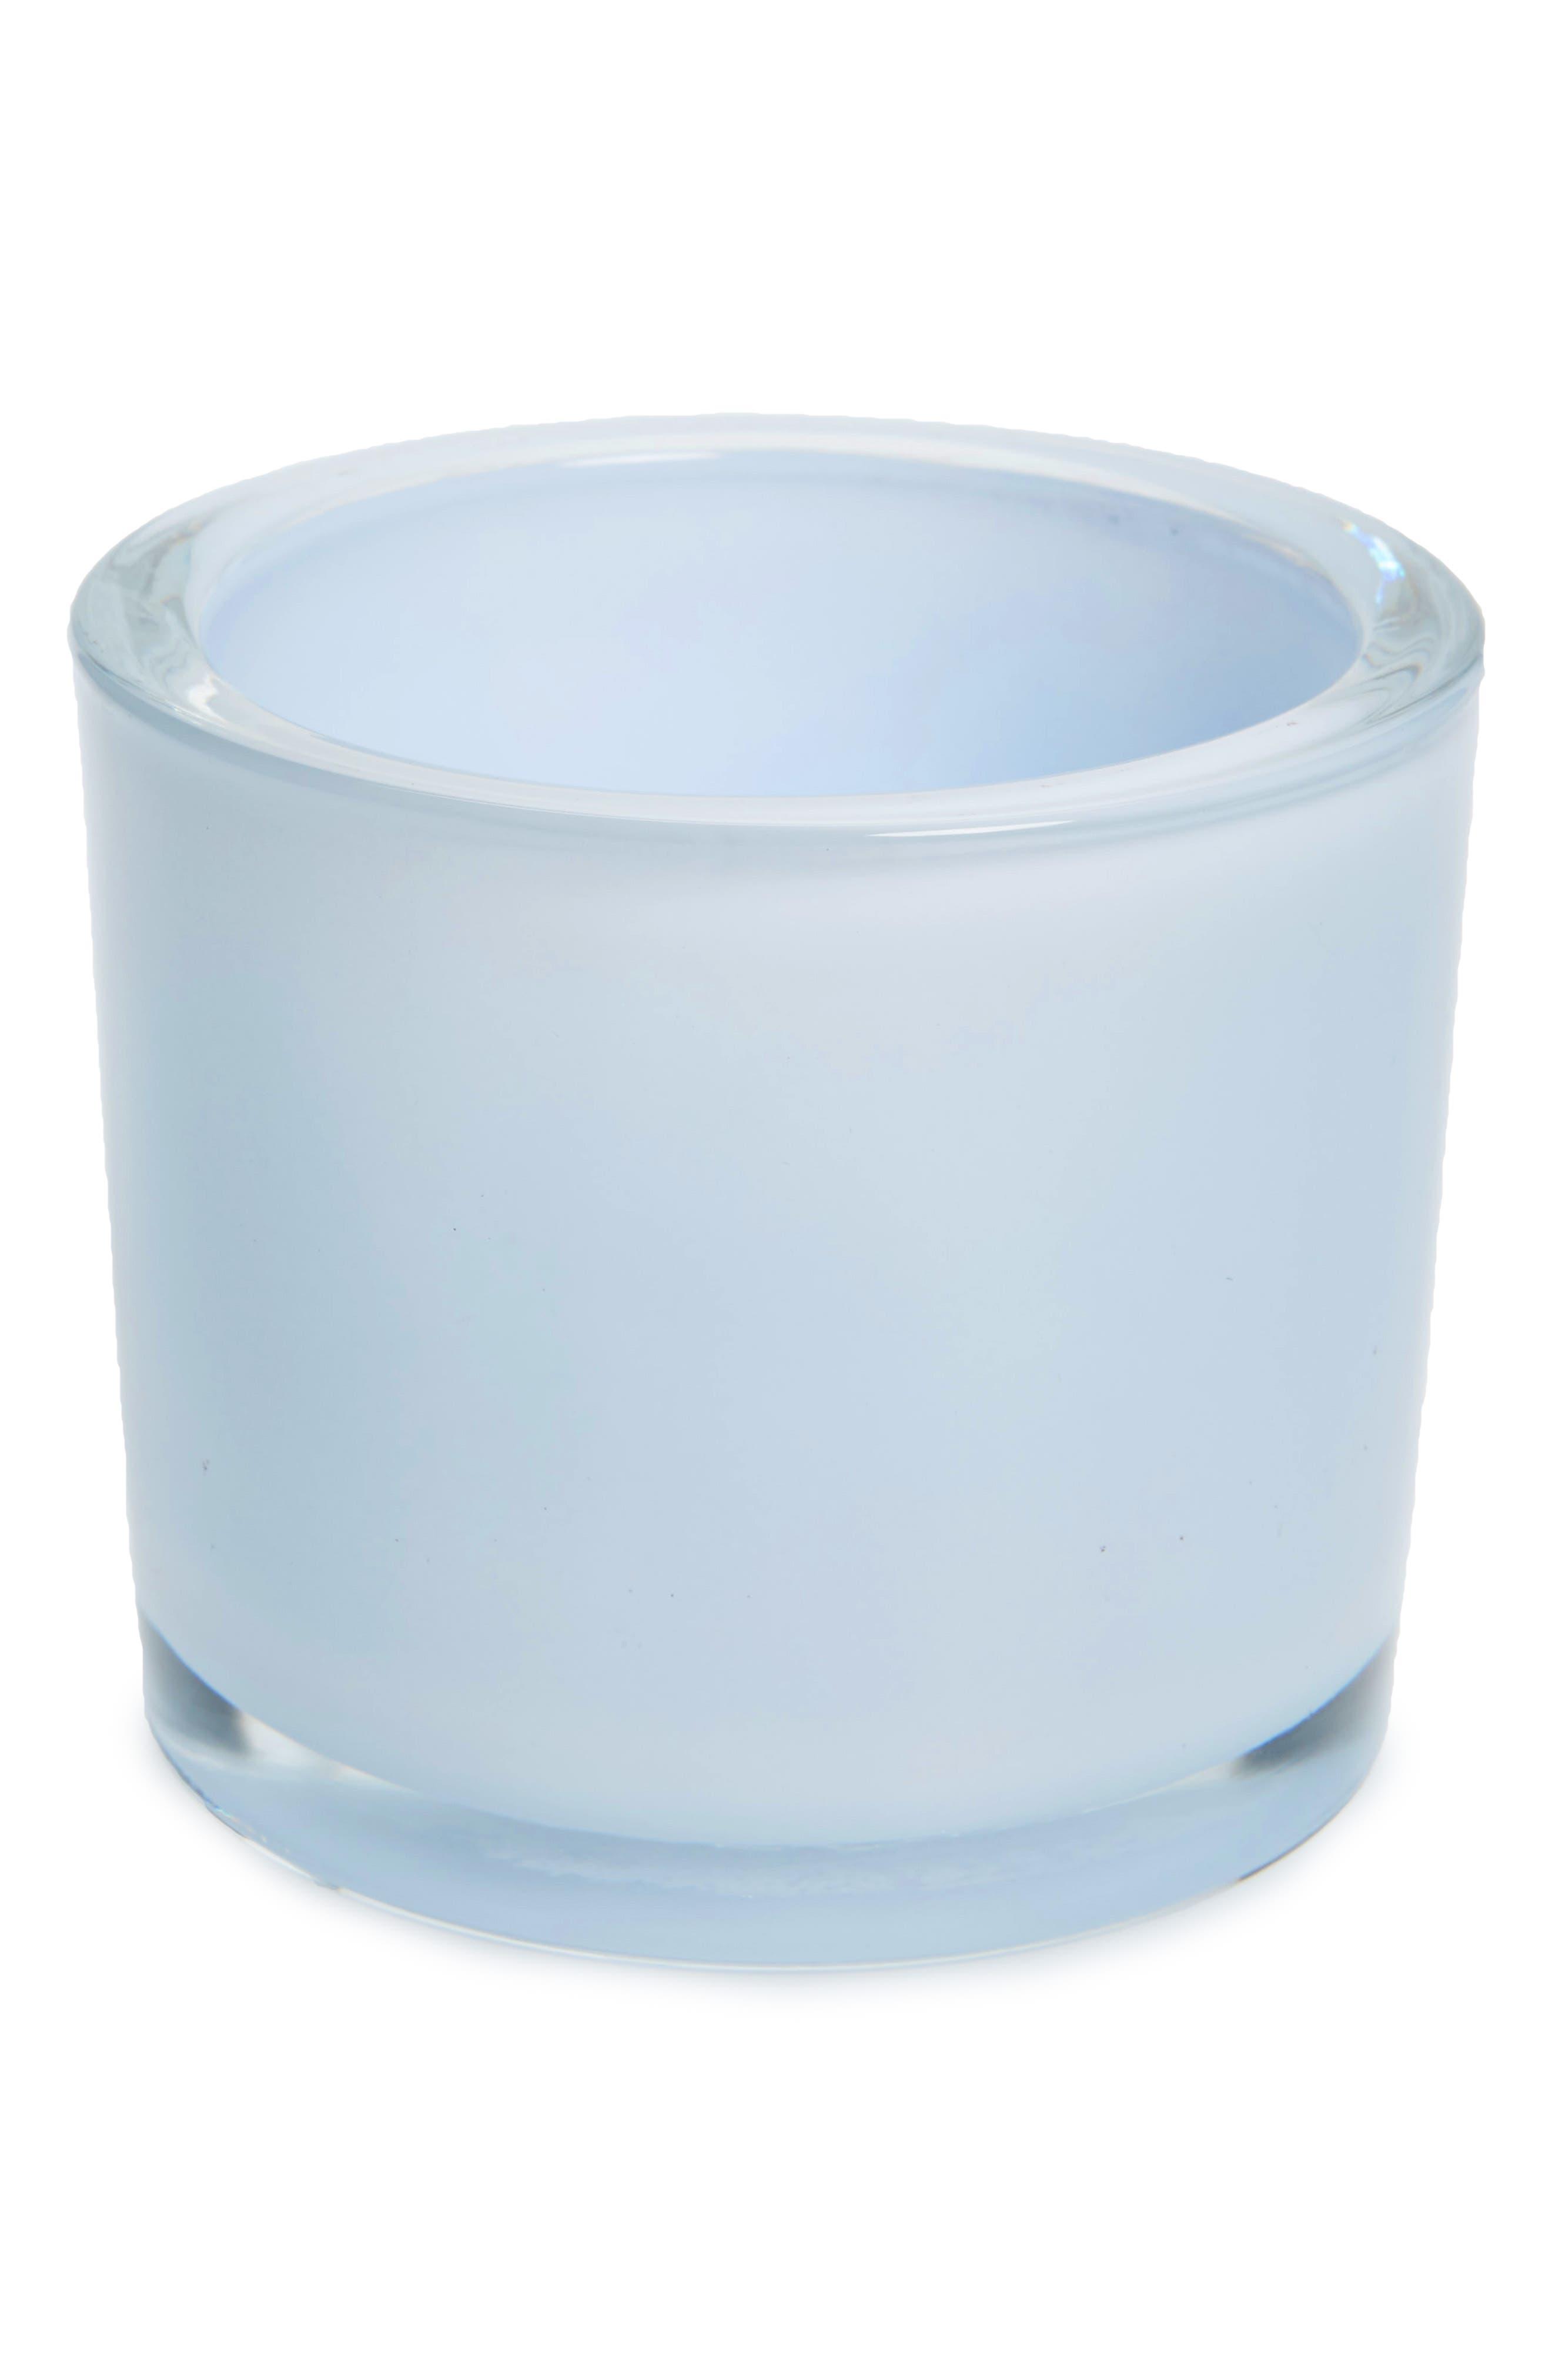 Design Imports Blue Glass Votive Holder